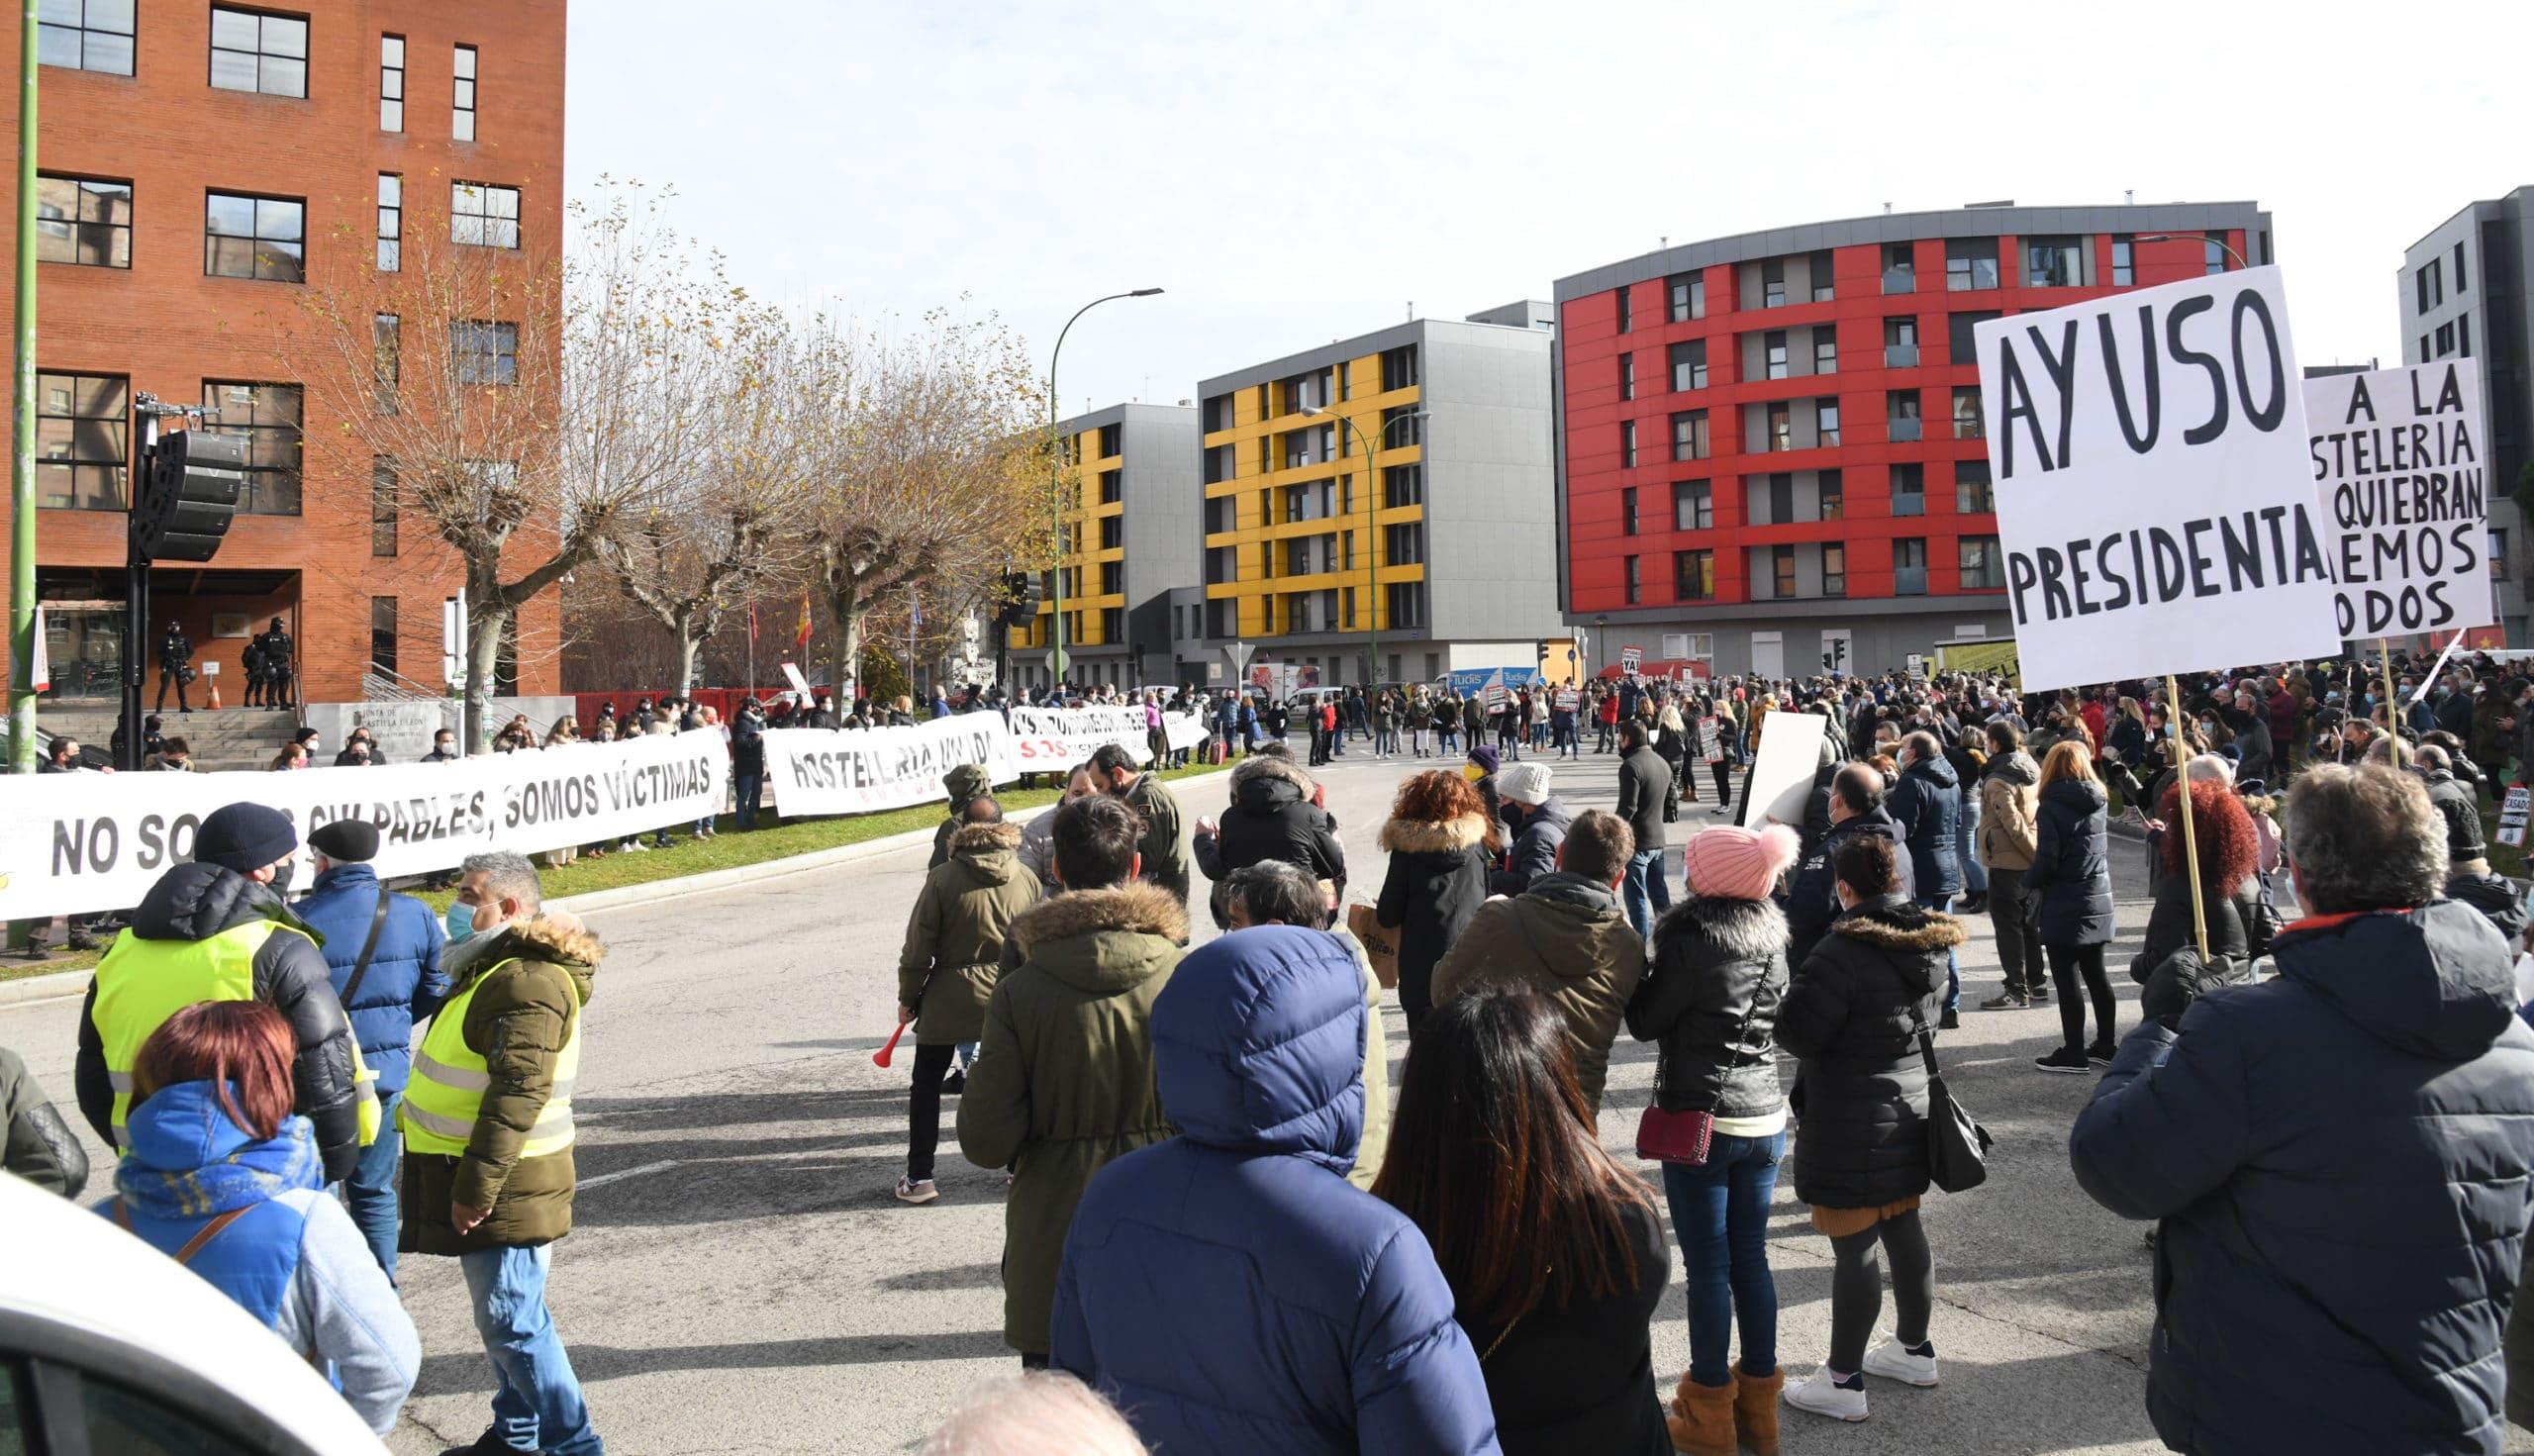 De la Rosa pide a la Junta la reapertura de bares en Burgos